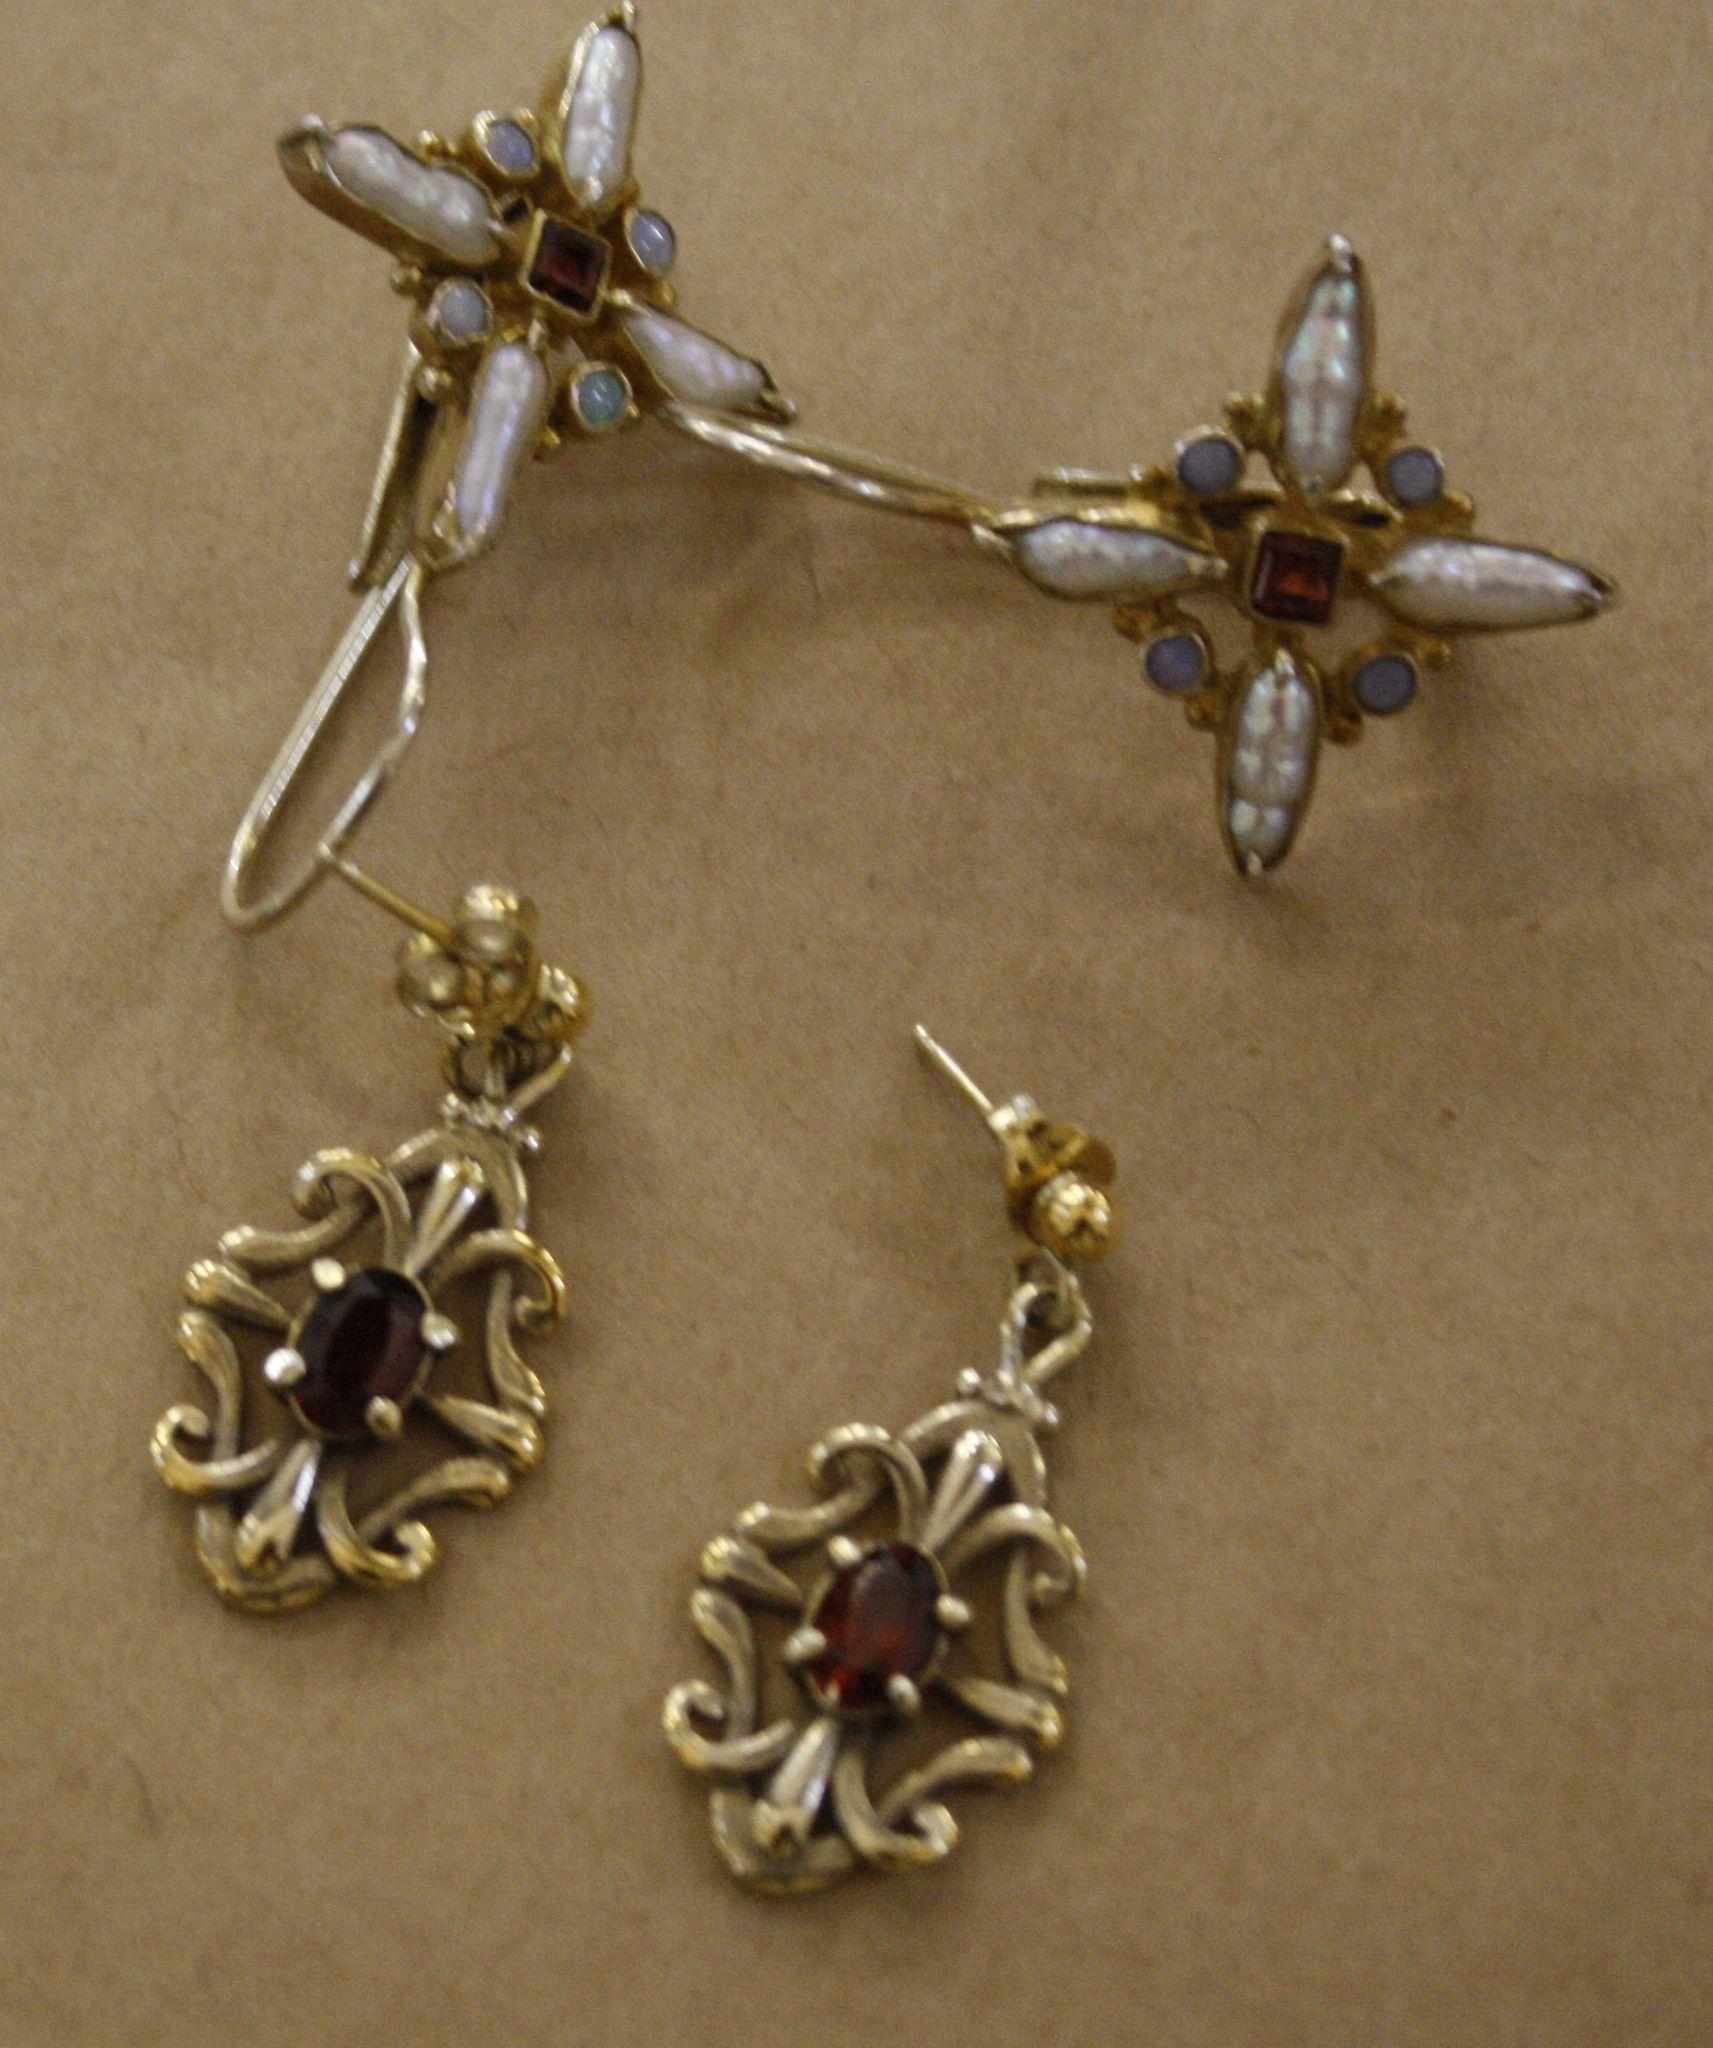 A pair of silver drop earrings